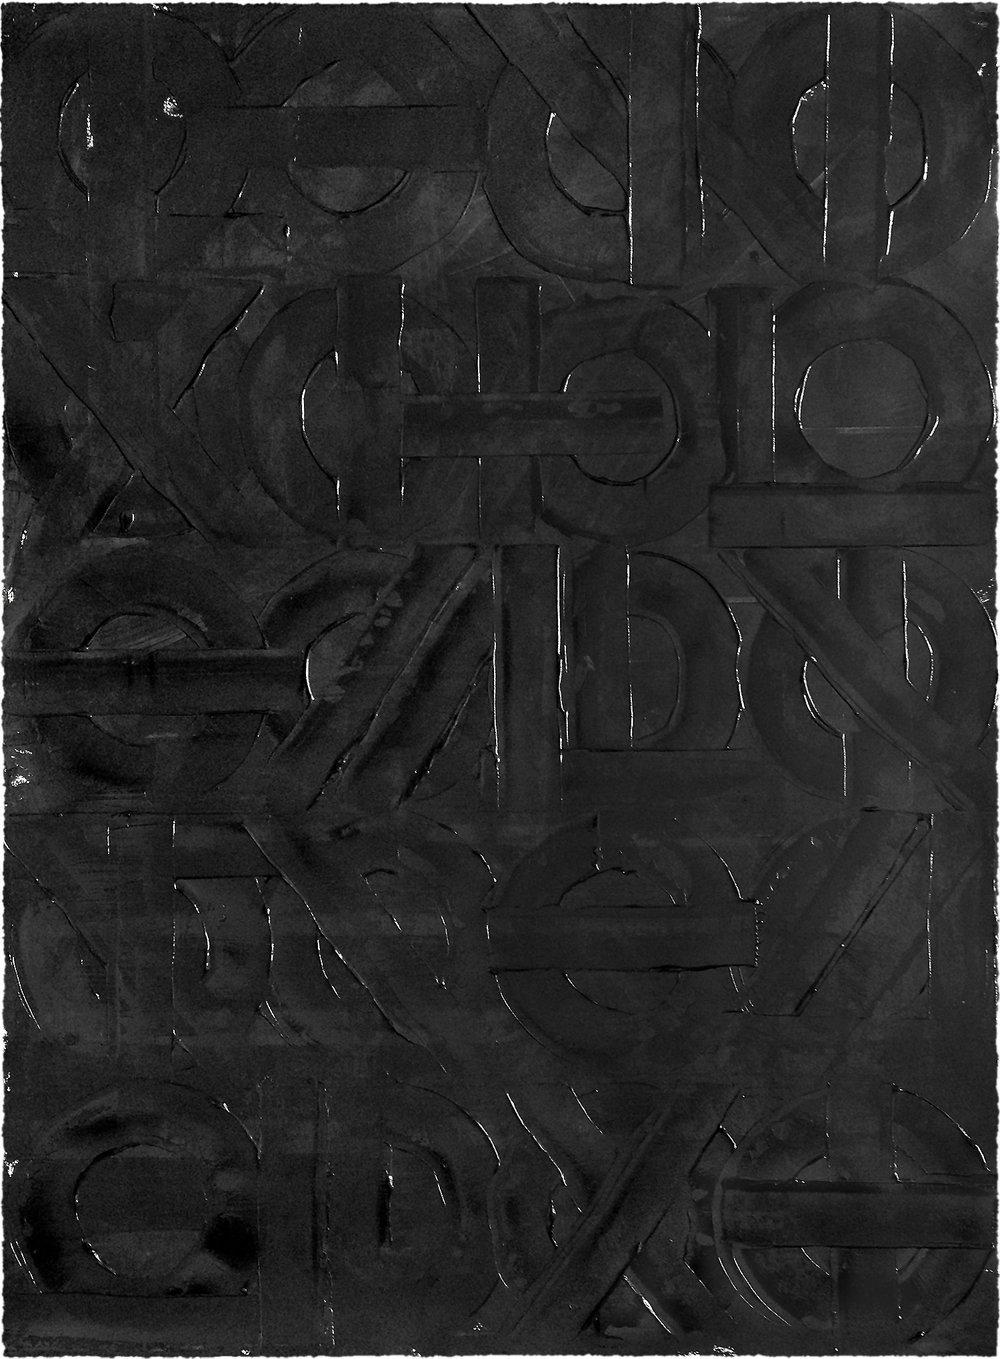 Círculos y Líneas — Diego Berjon